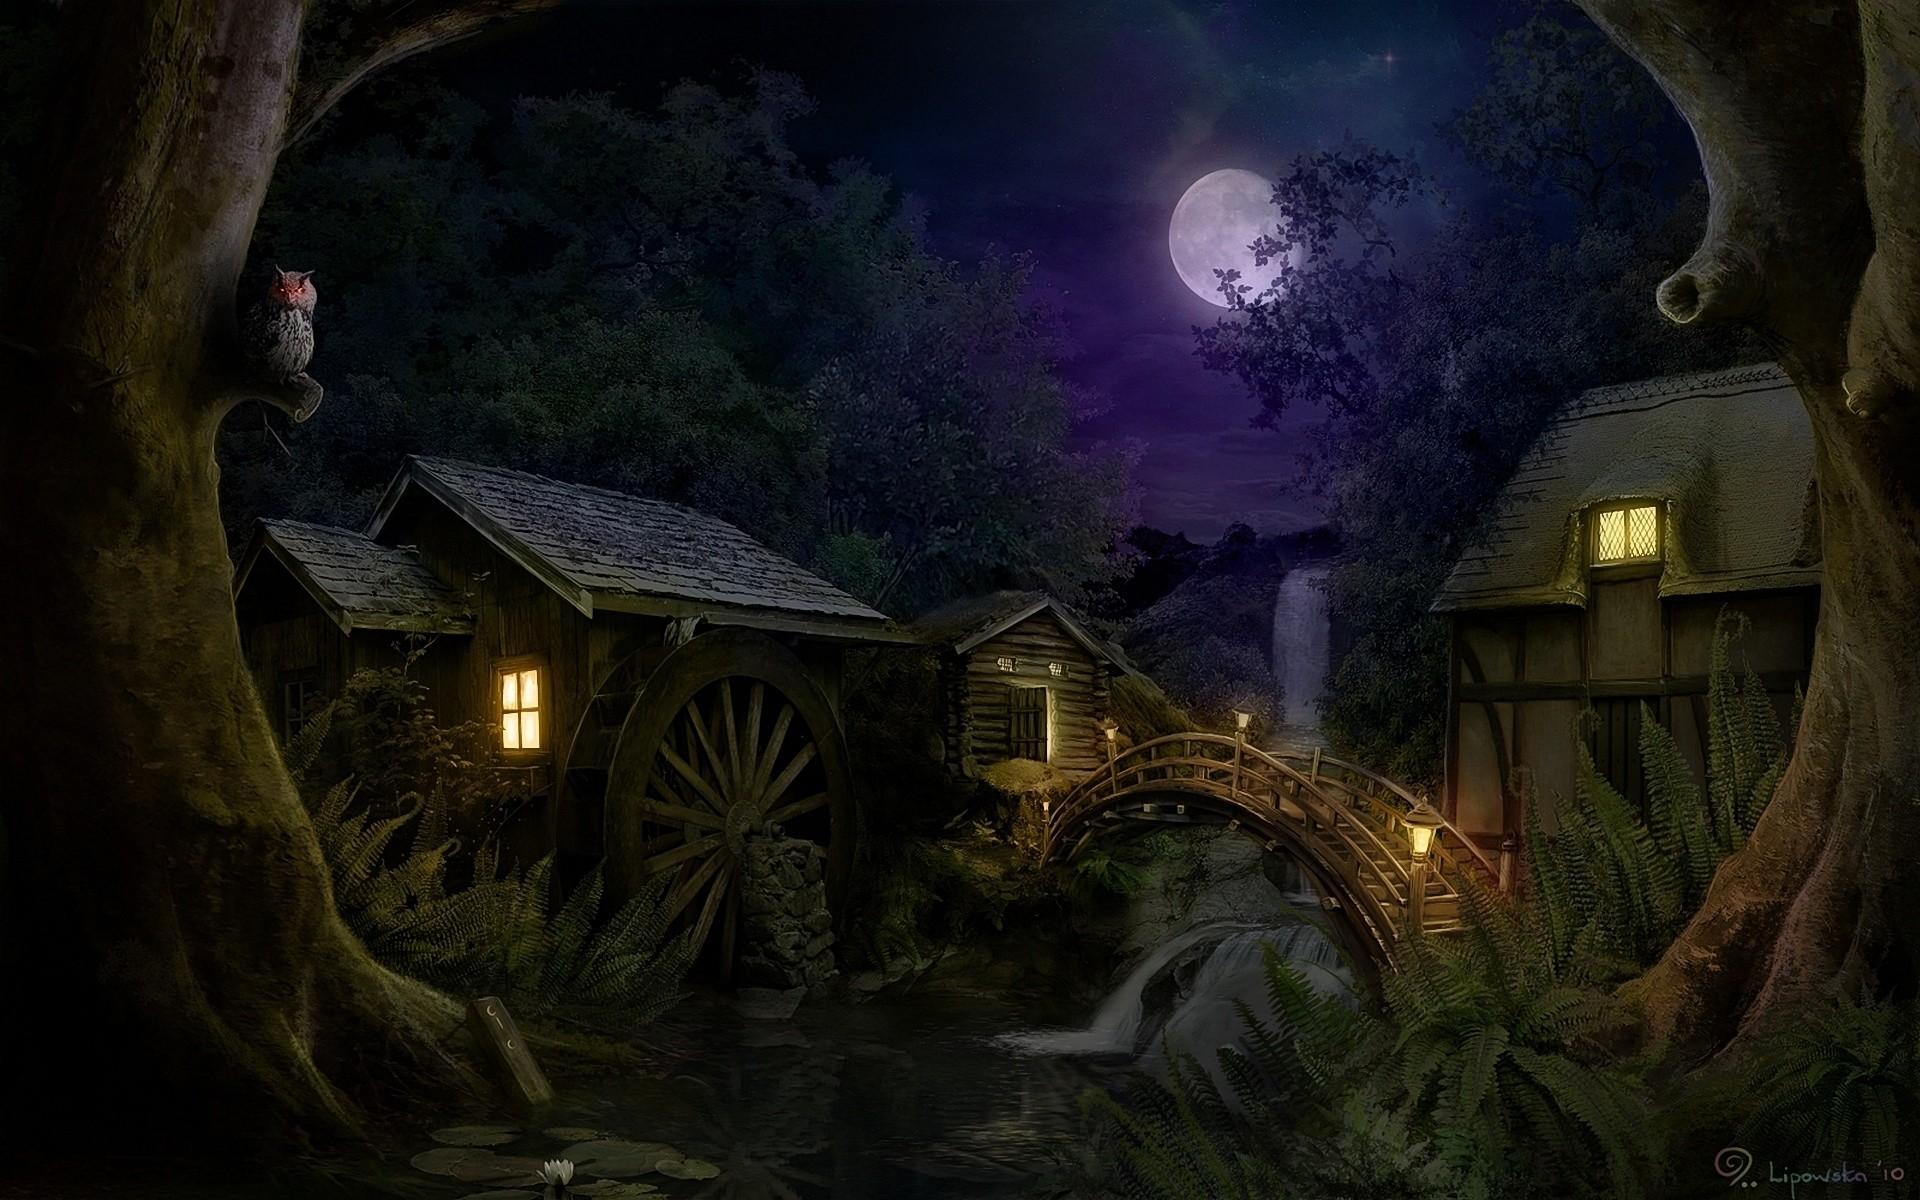 night, house, moon, bridge, waterfall, fantasy